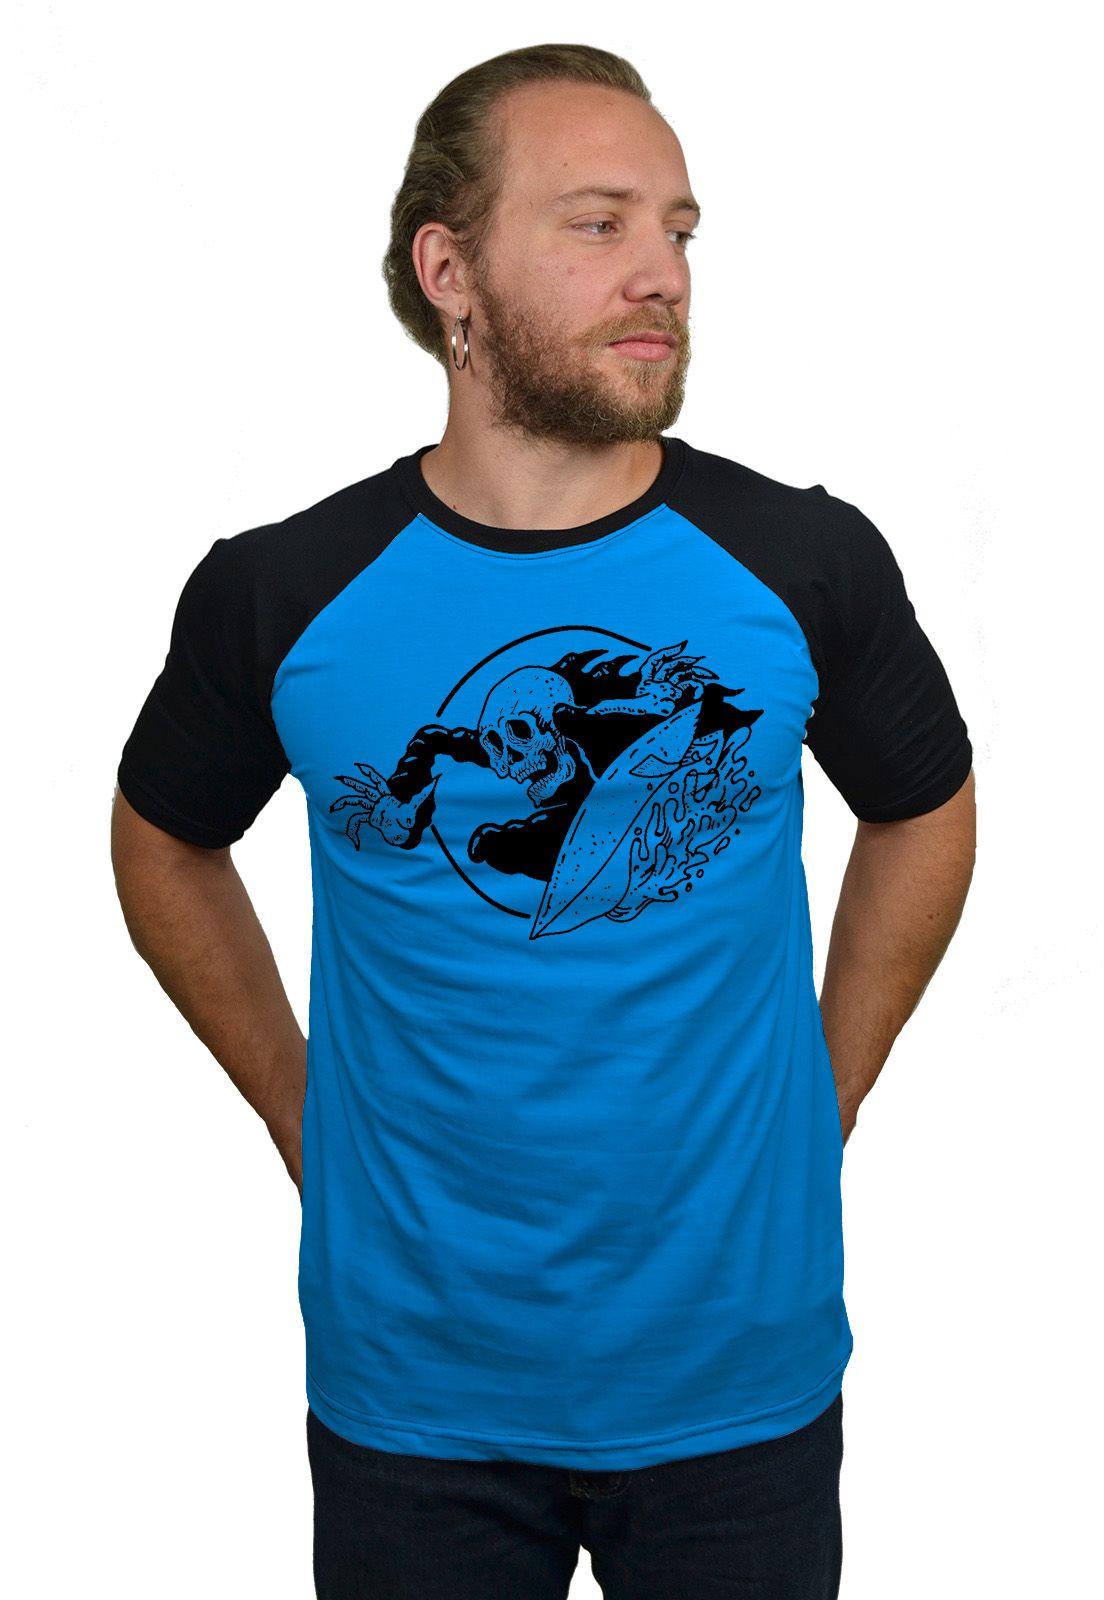 Camiseta Raglan Hshop Surfin - Azul Turquesa com Preto  - HShop